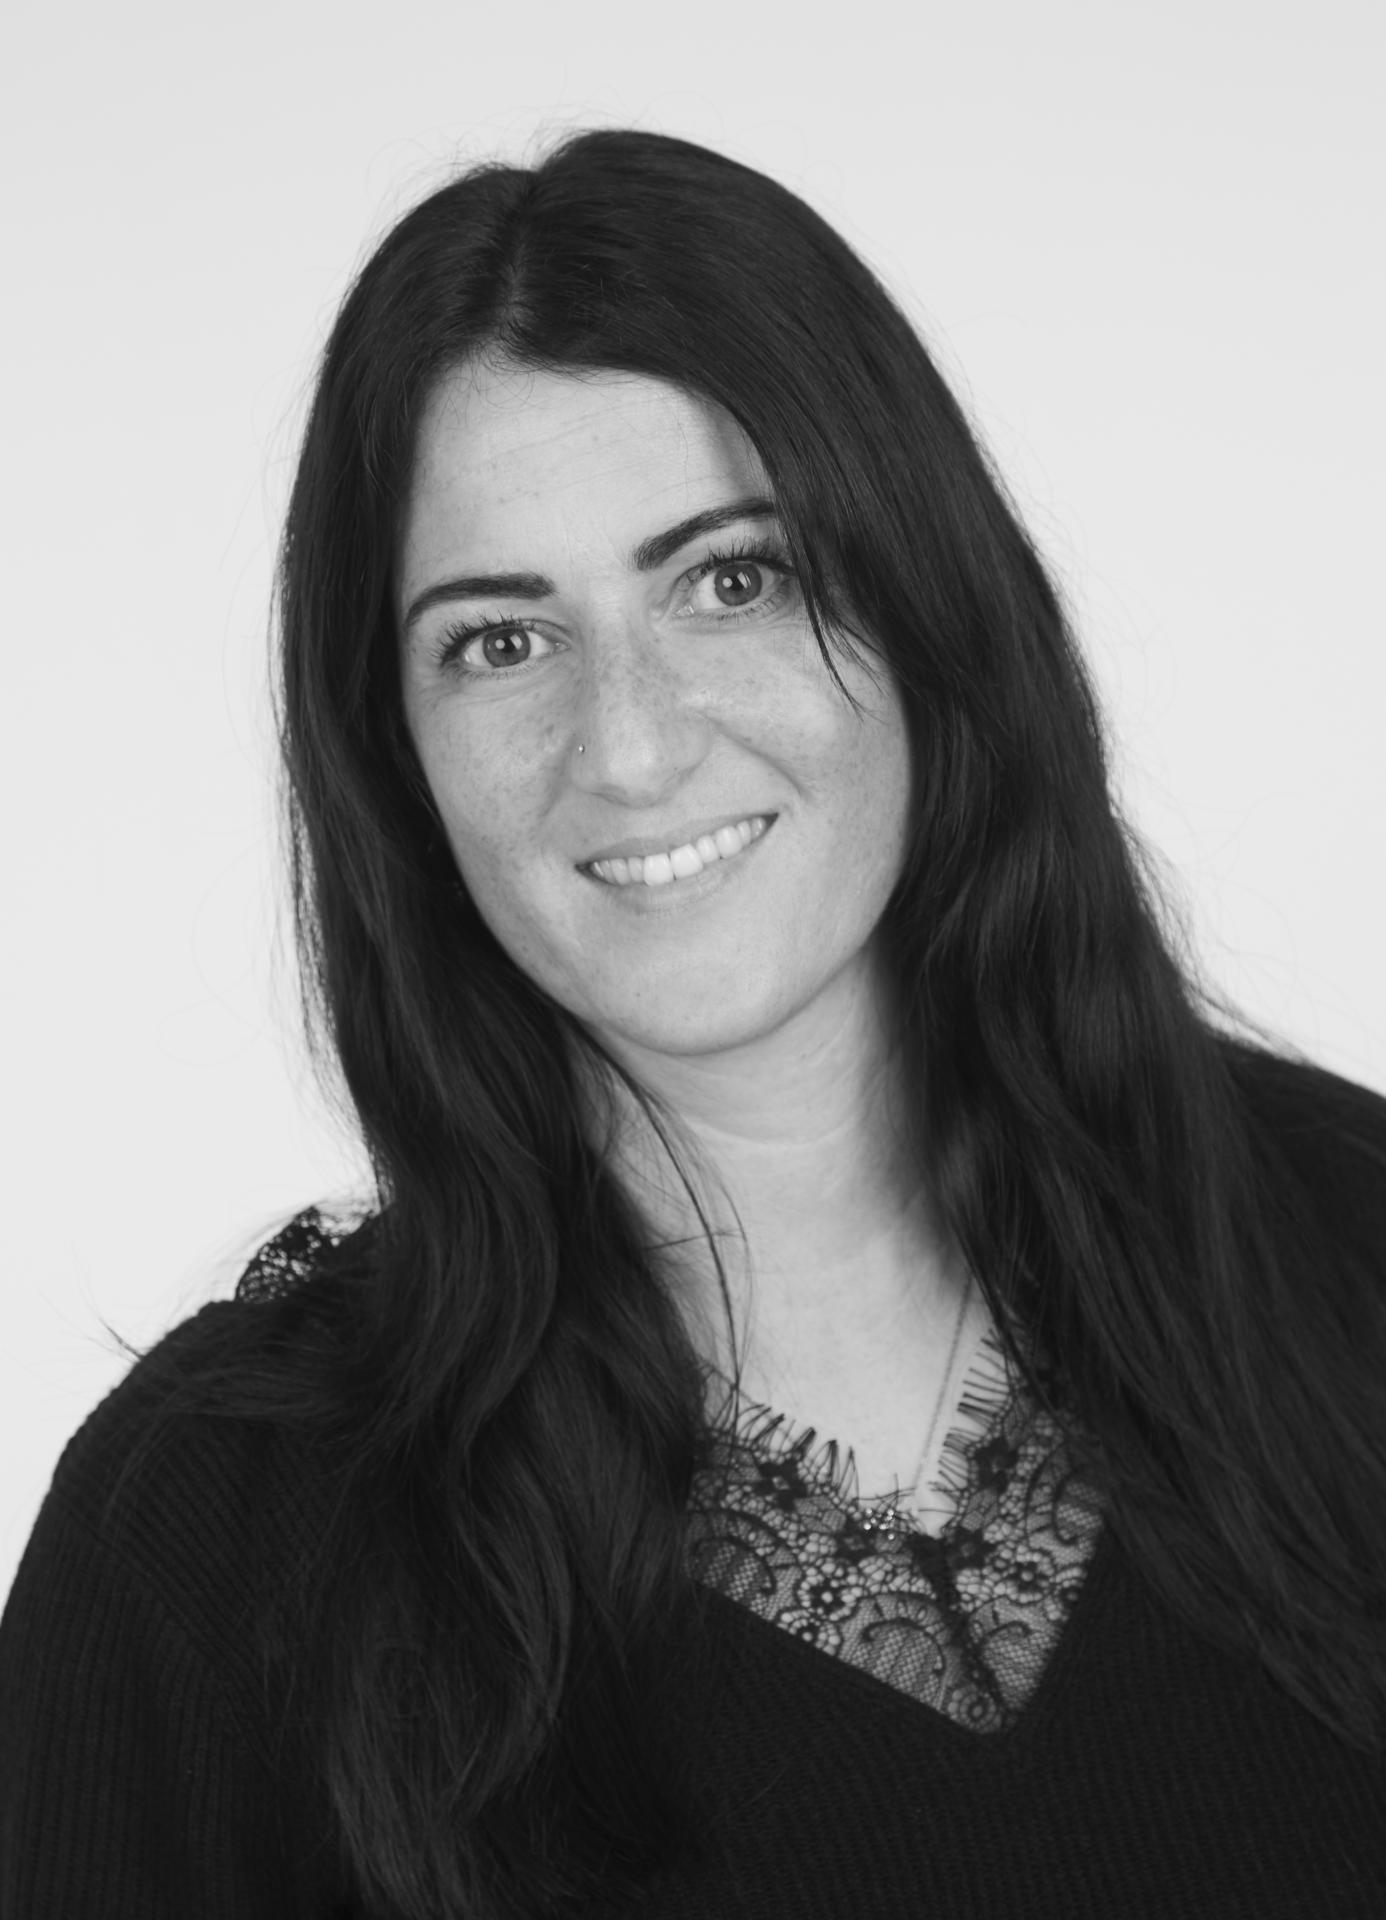 Melinda Gomes